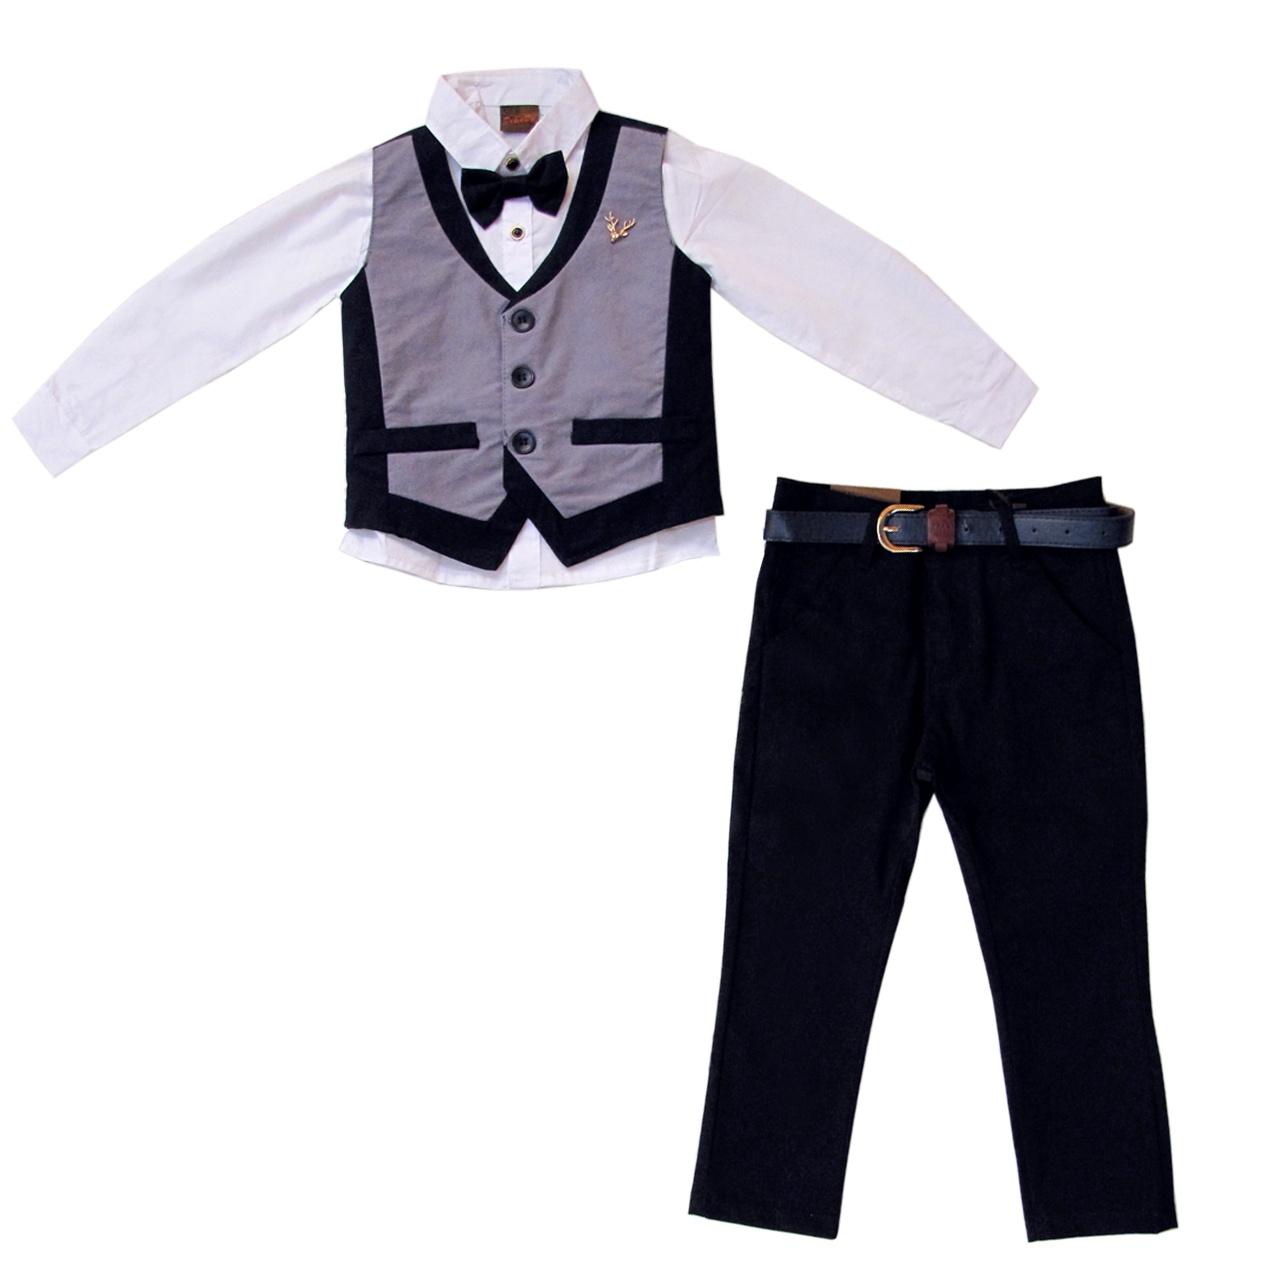 ست 5 تکه لباس پسرانه کد 0021